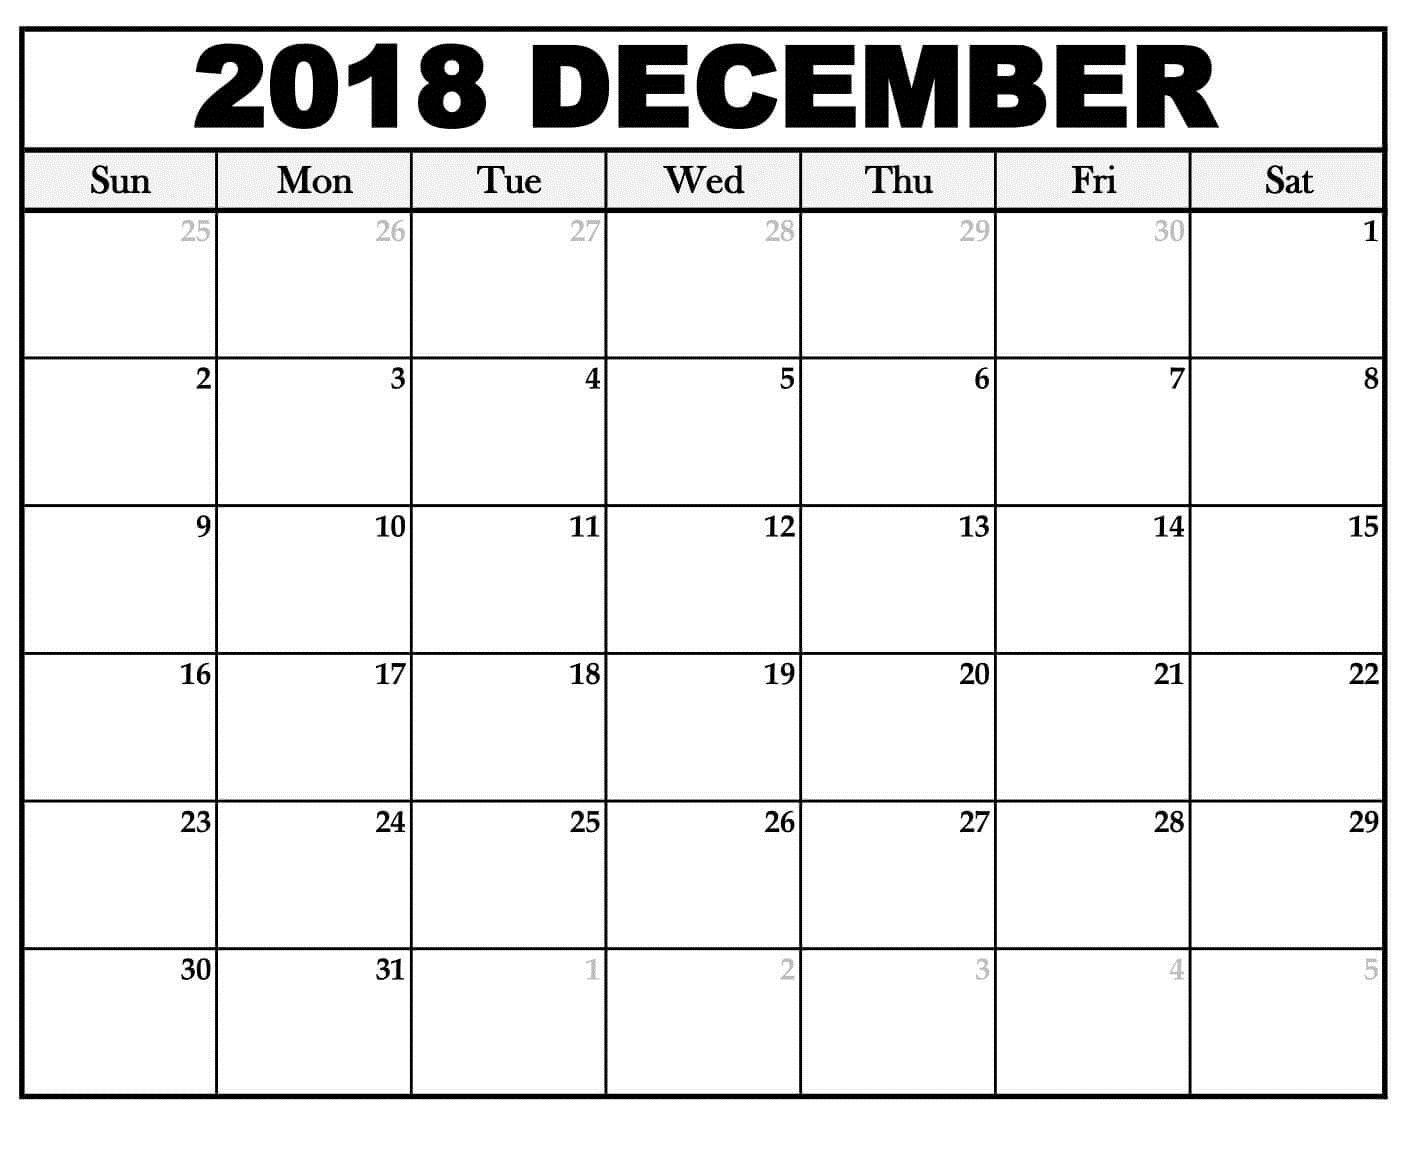 December Calendar 2018 For #landscape | Calendar 2019